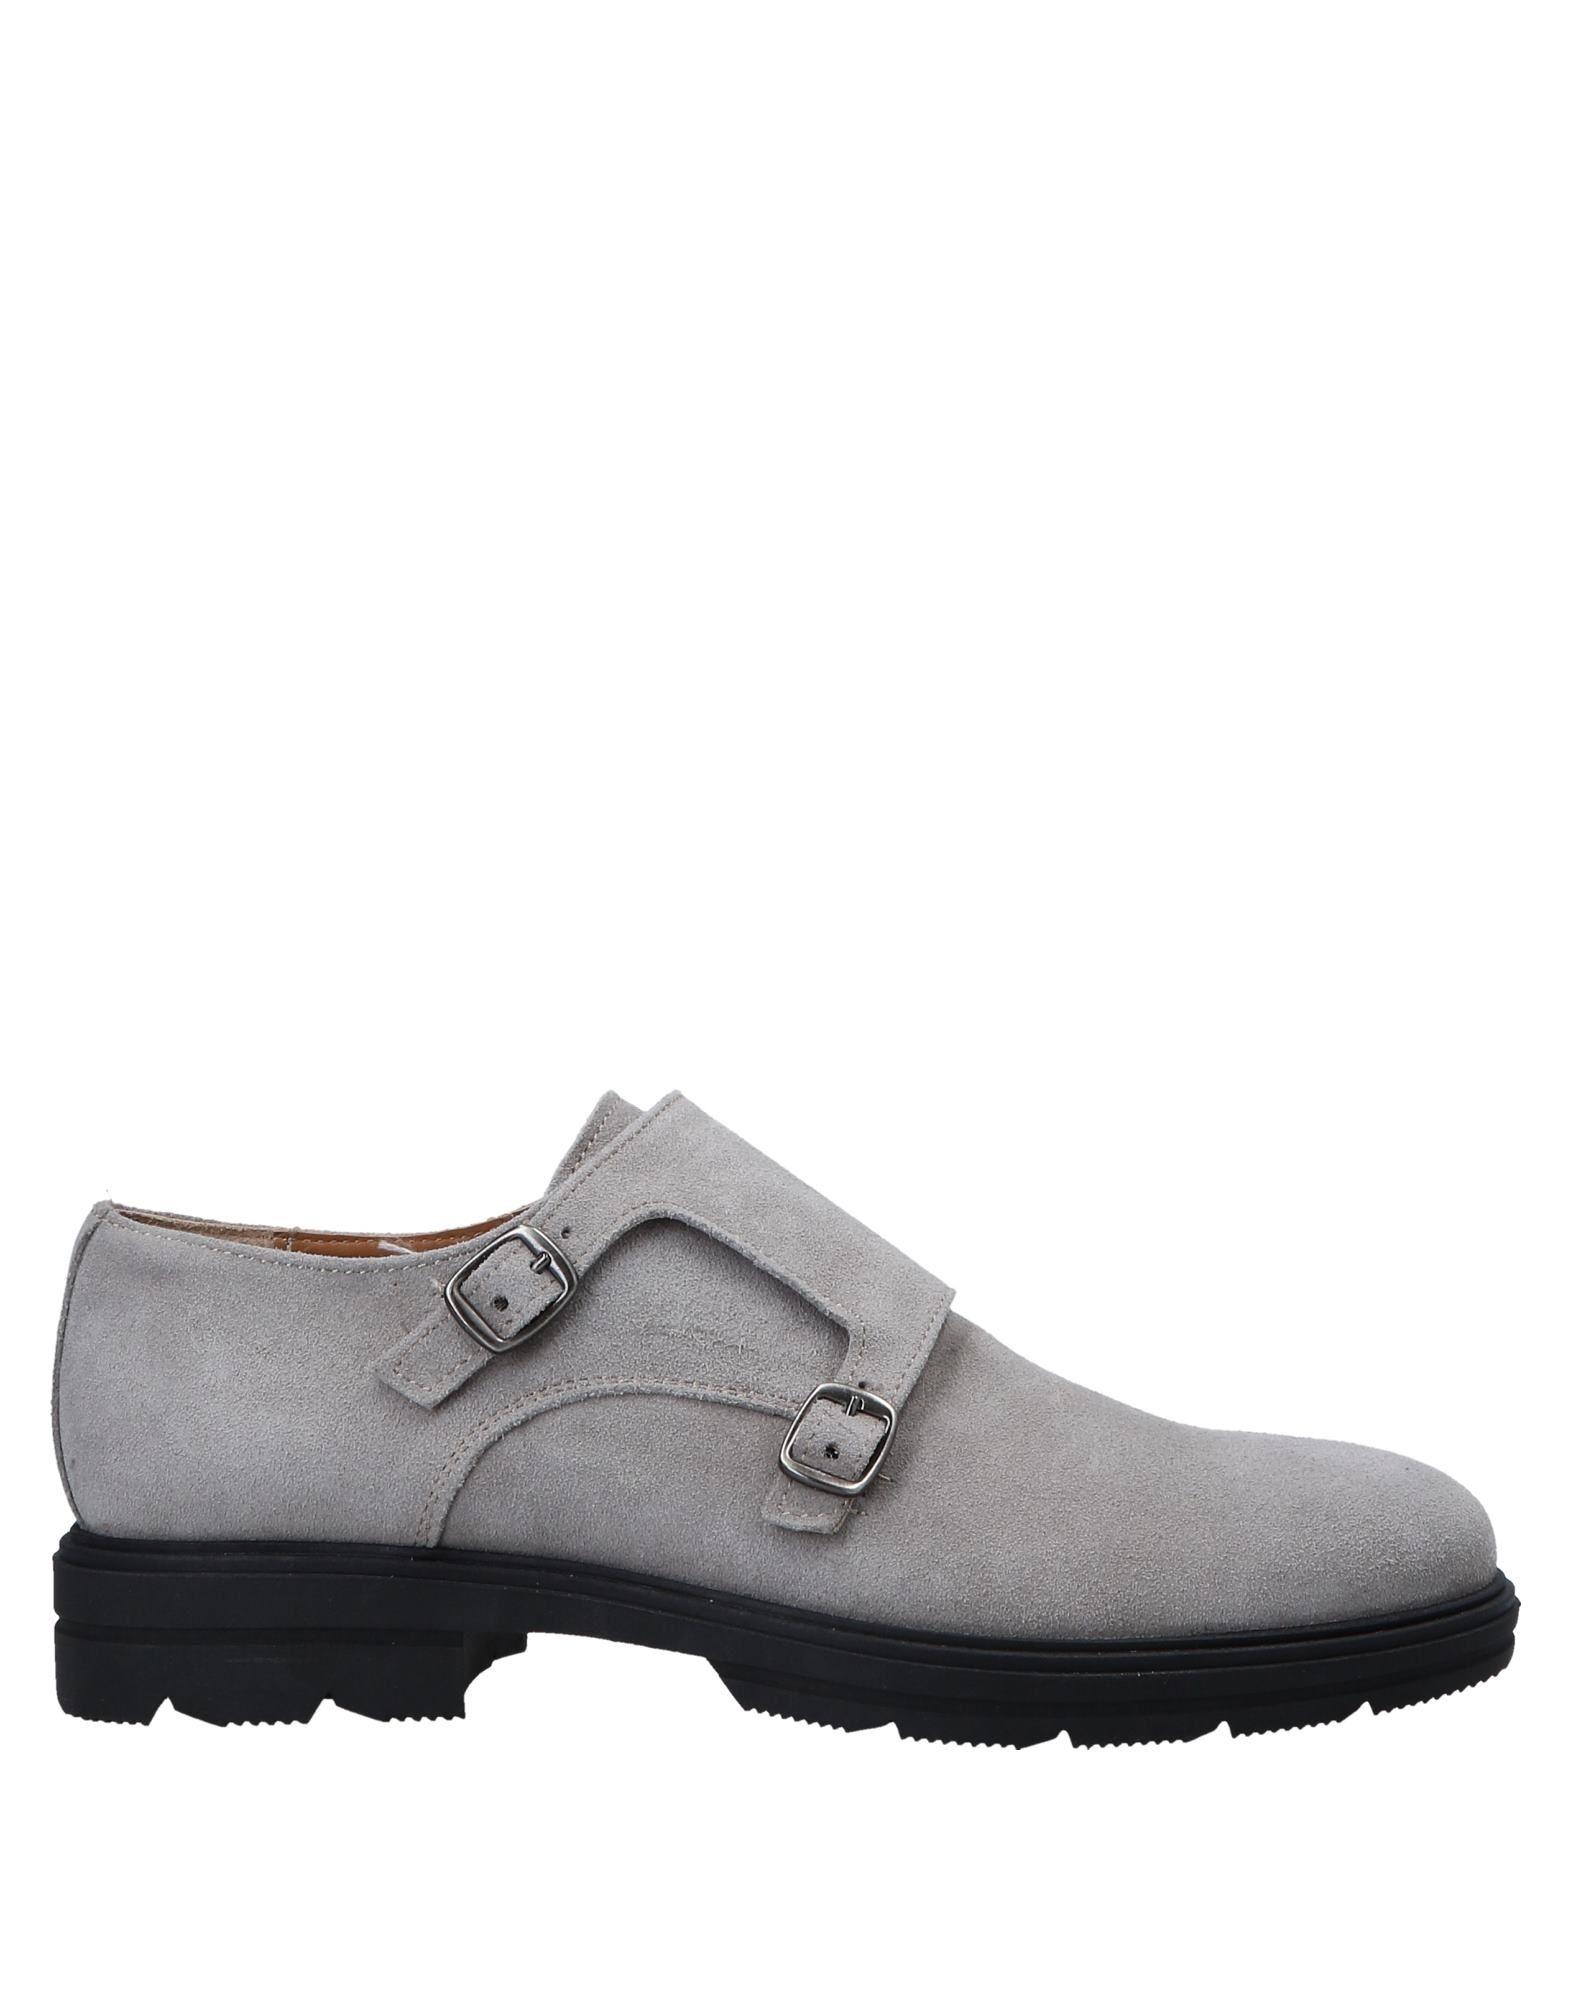 Donato Boutique Loafers - Men Donato Boutique Canada Loafers online on  Canada Boutique - 11548959WT de0d5b